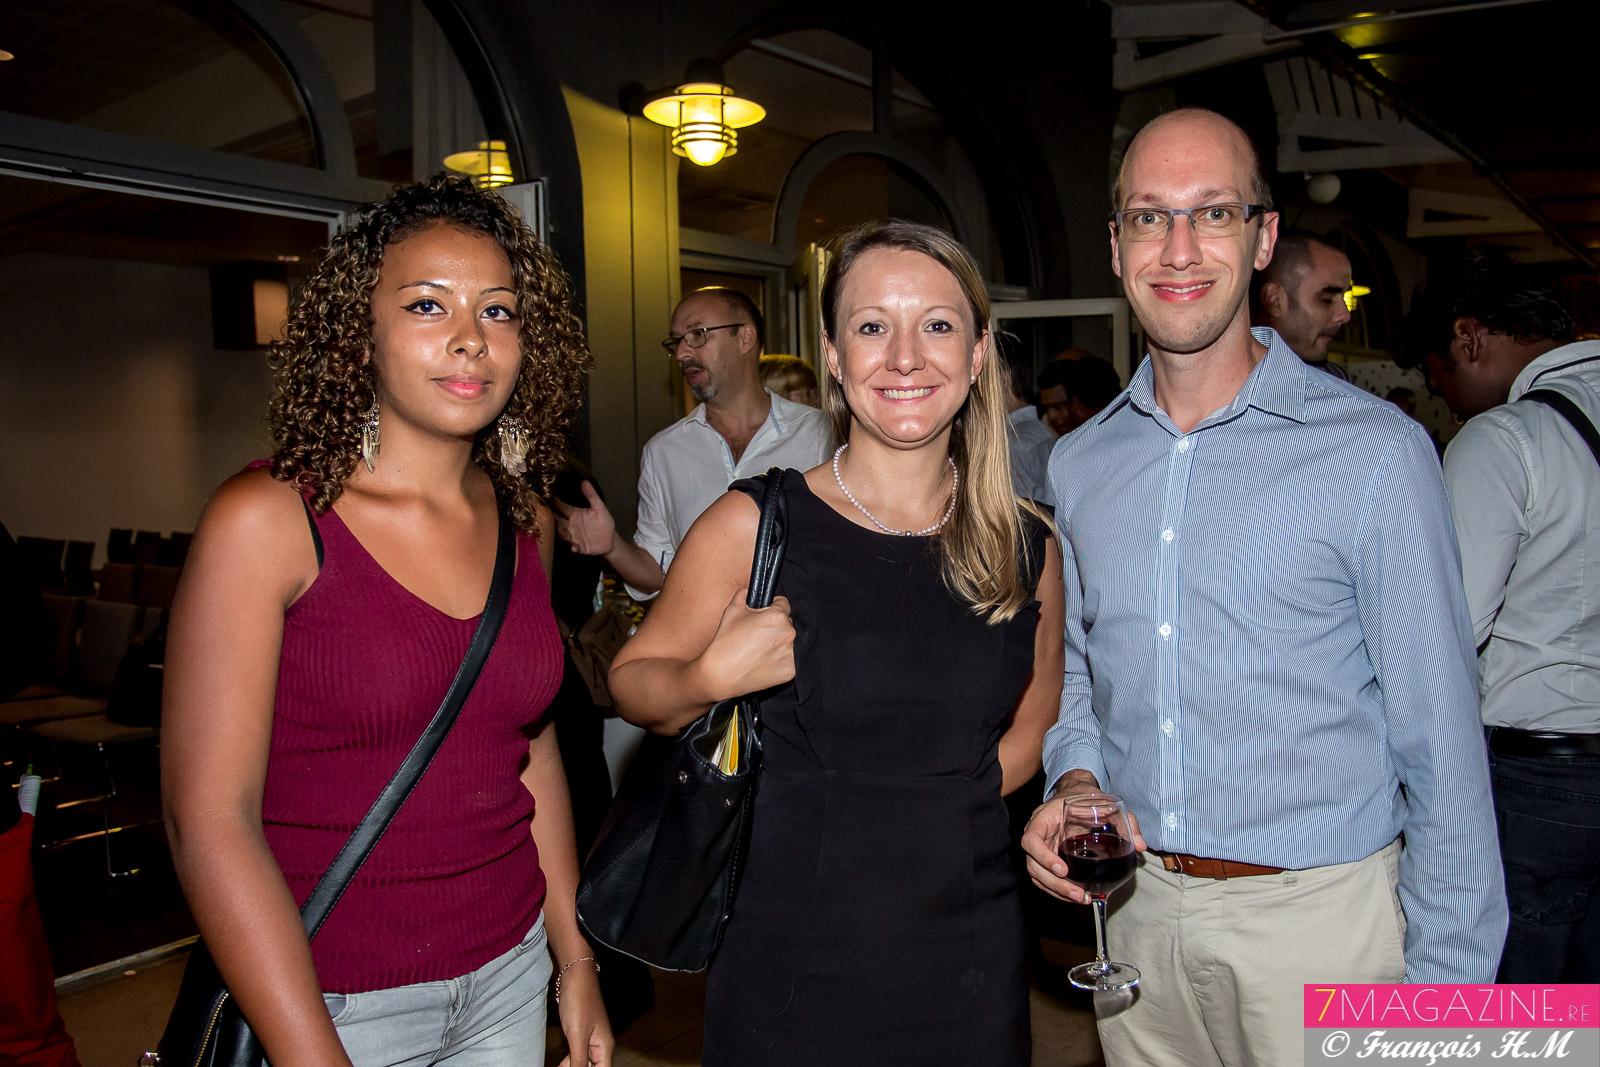 Honorine, Sandrine Gillotin, Directrice restaurant Vapiano, Thomas Lauret, de Runconcept